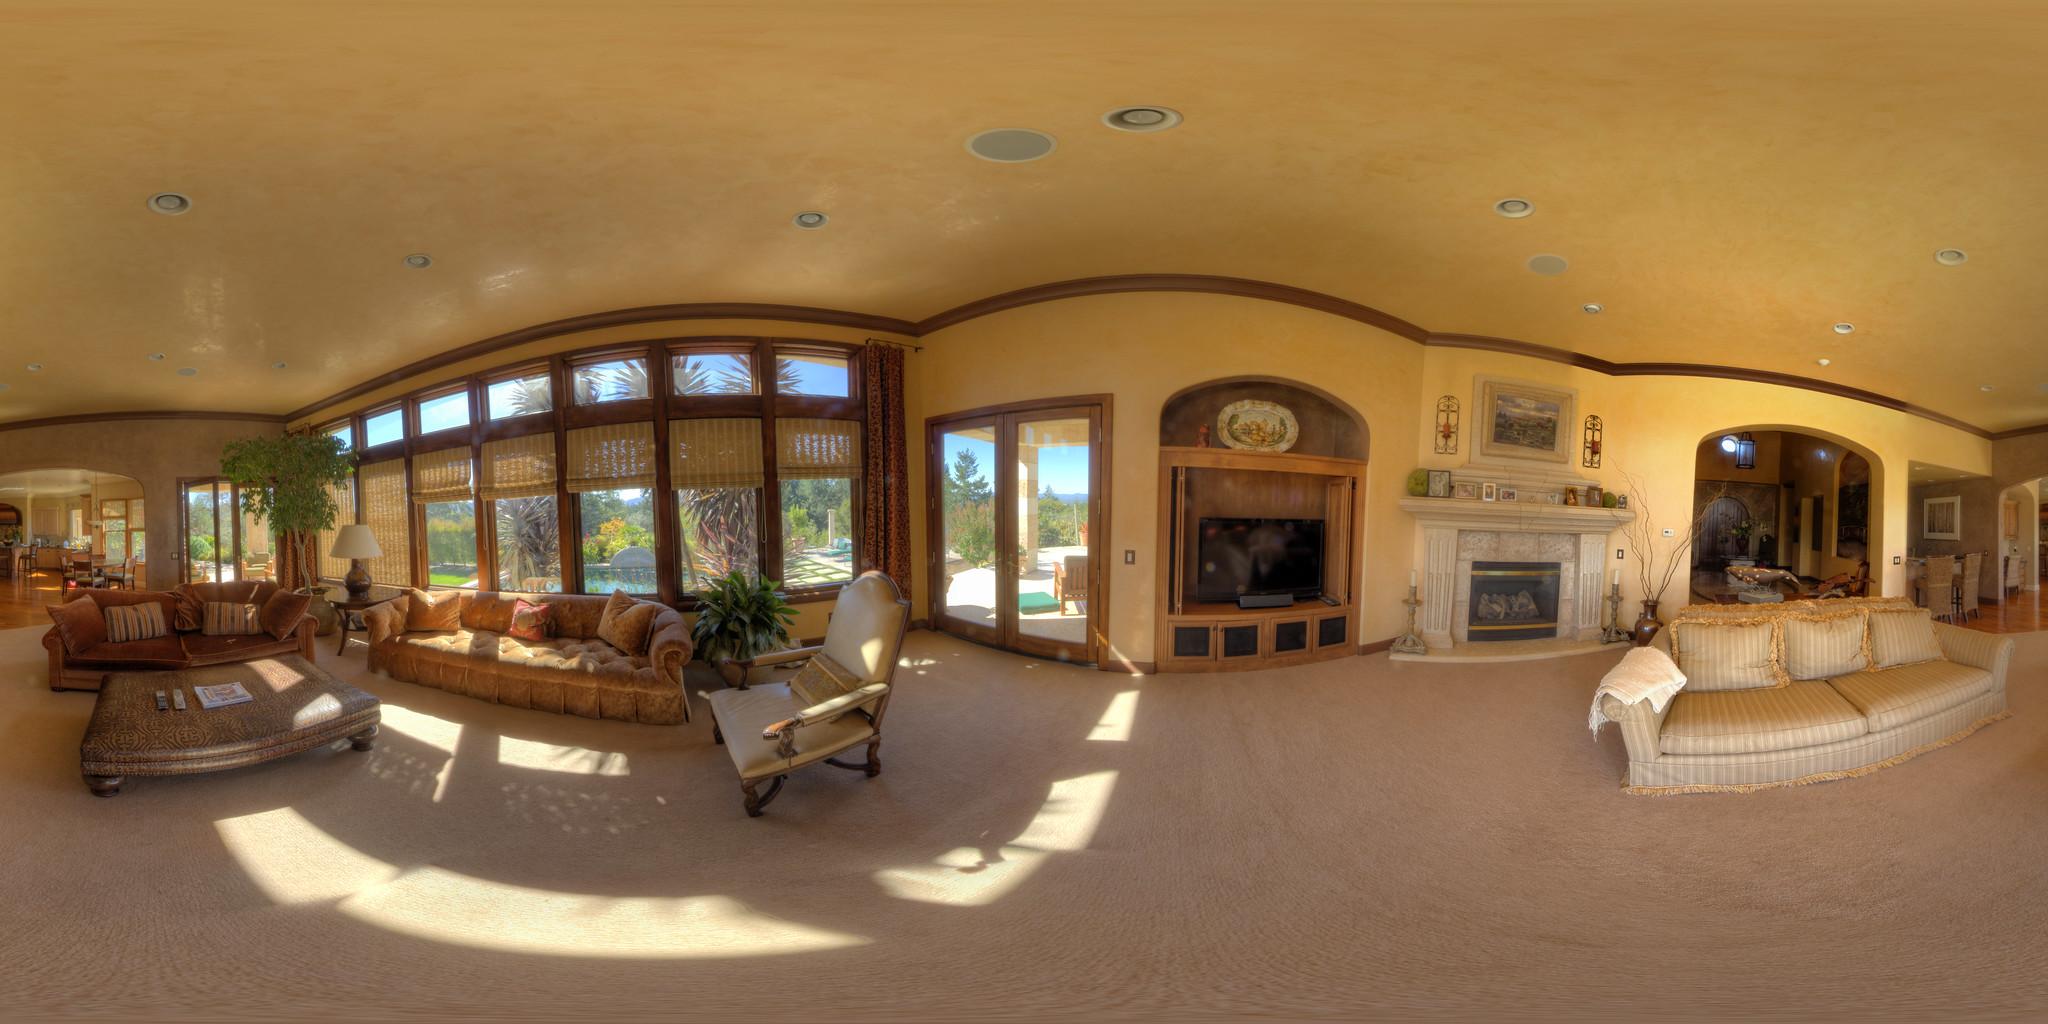 Mansion in Fountain Grove, California